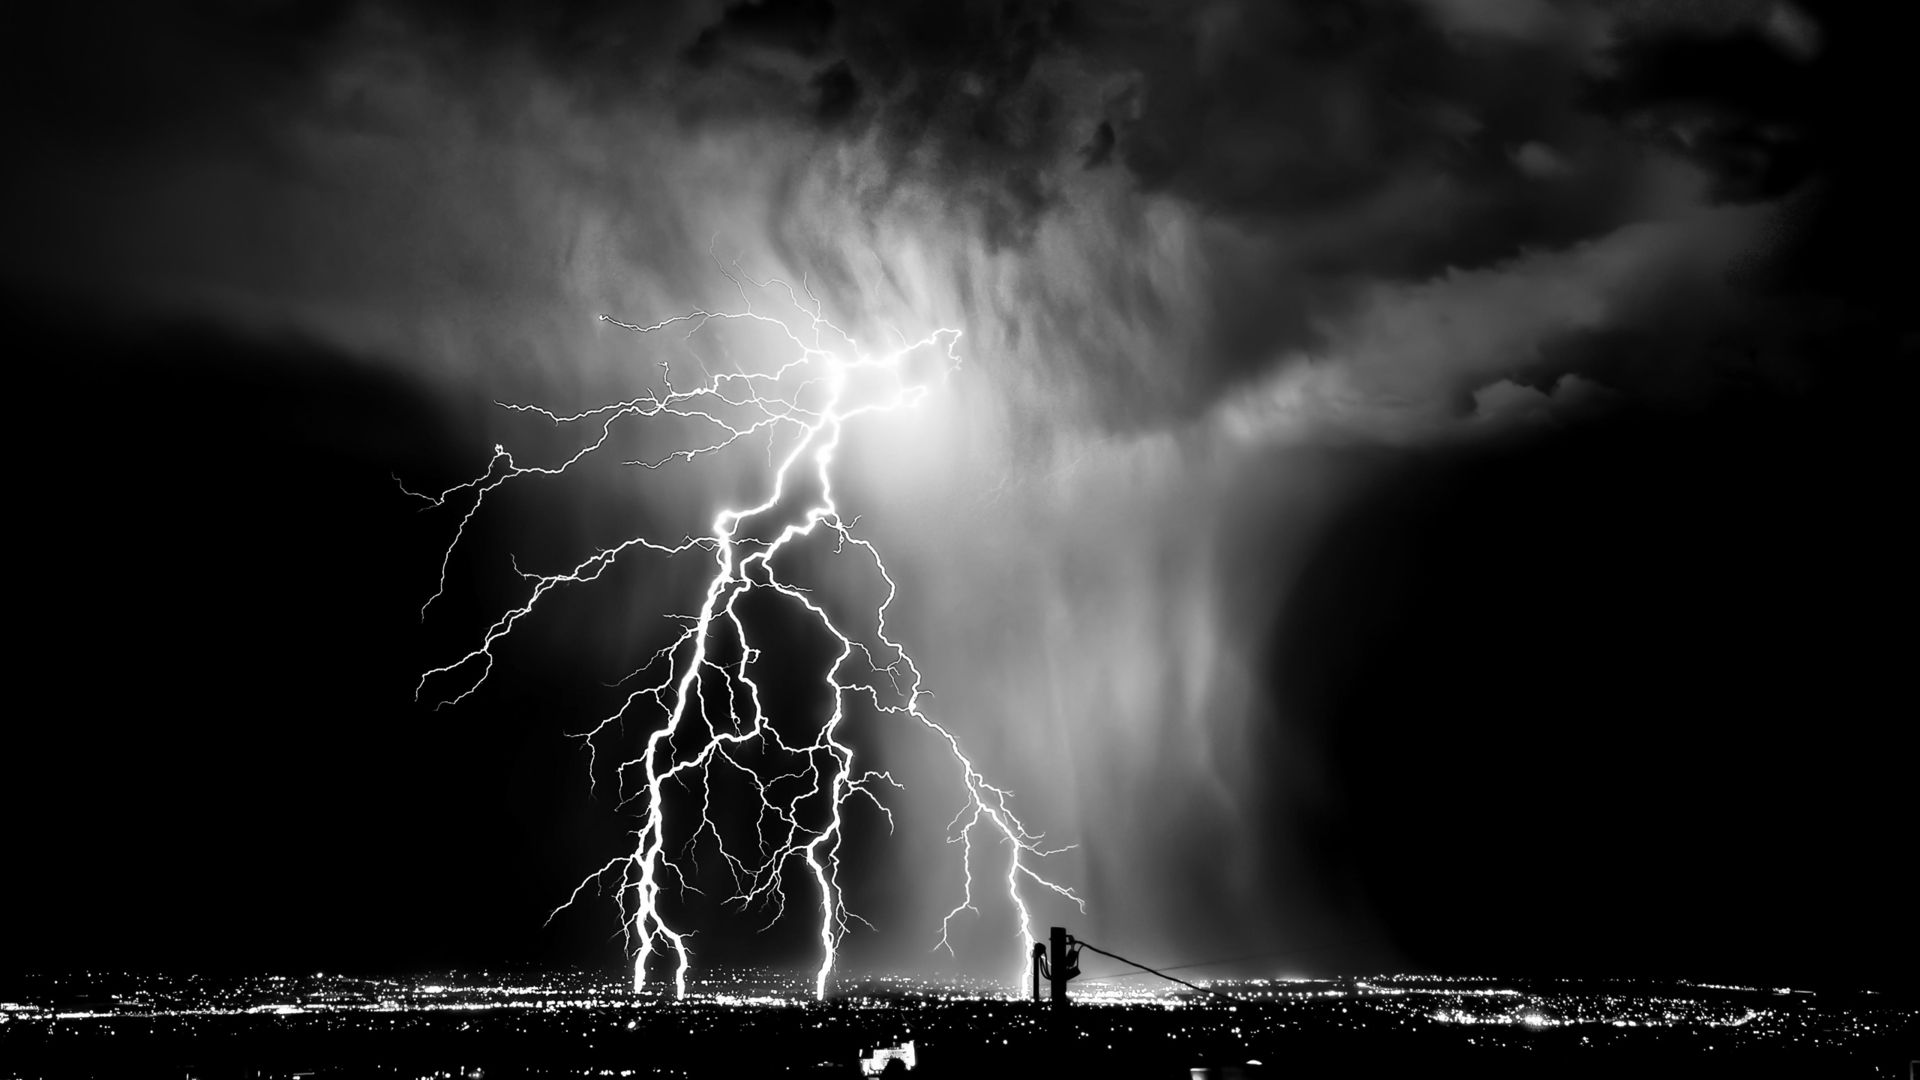 Lightning storm rain clouds sky nature thunderstorm